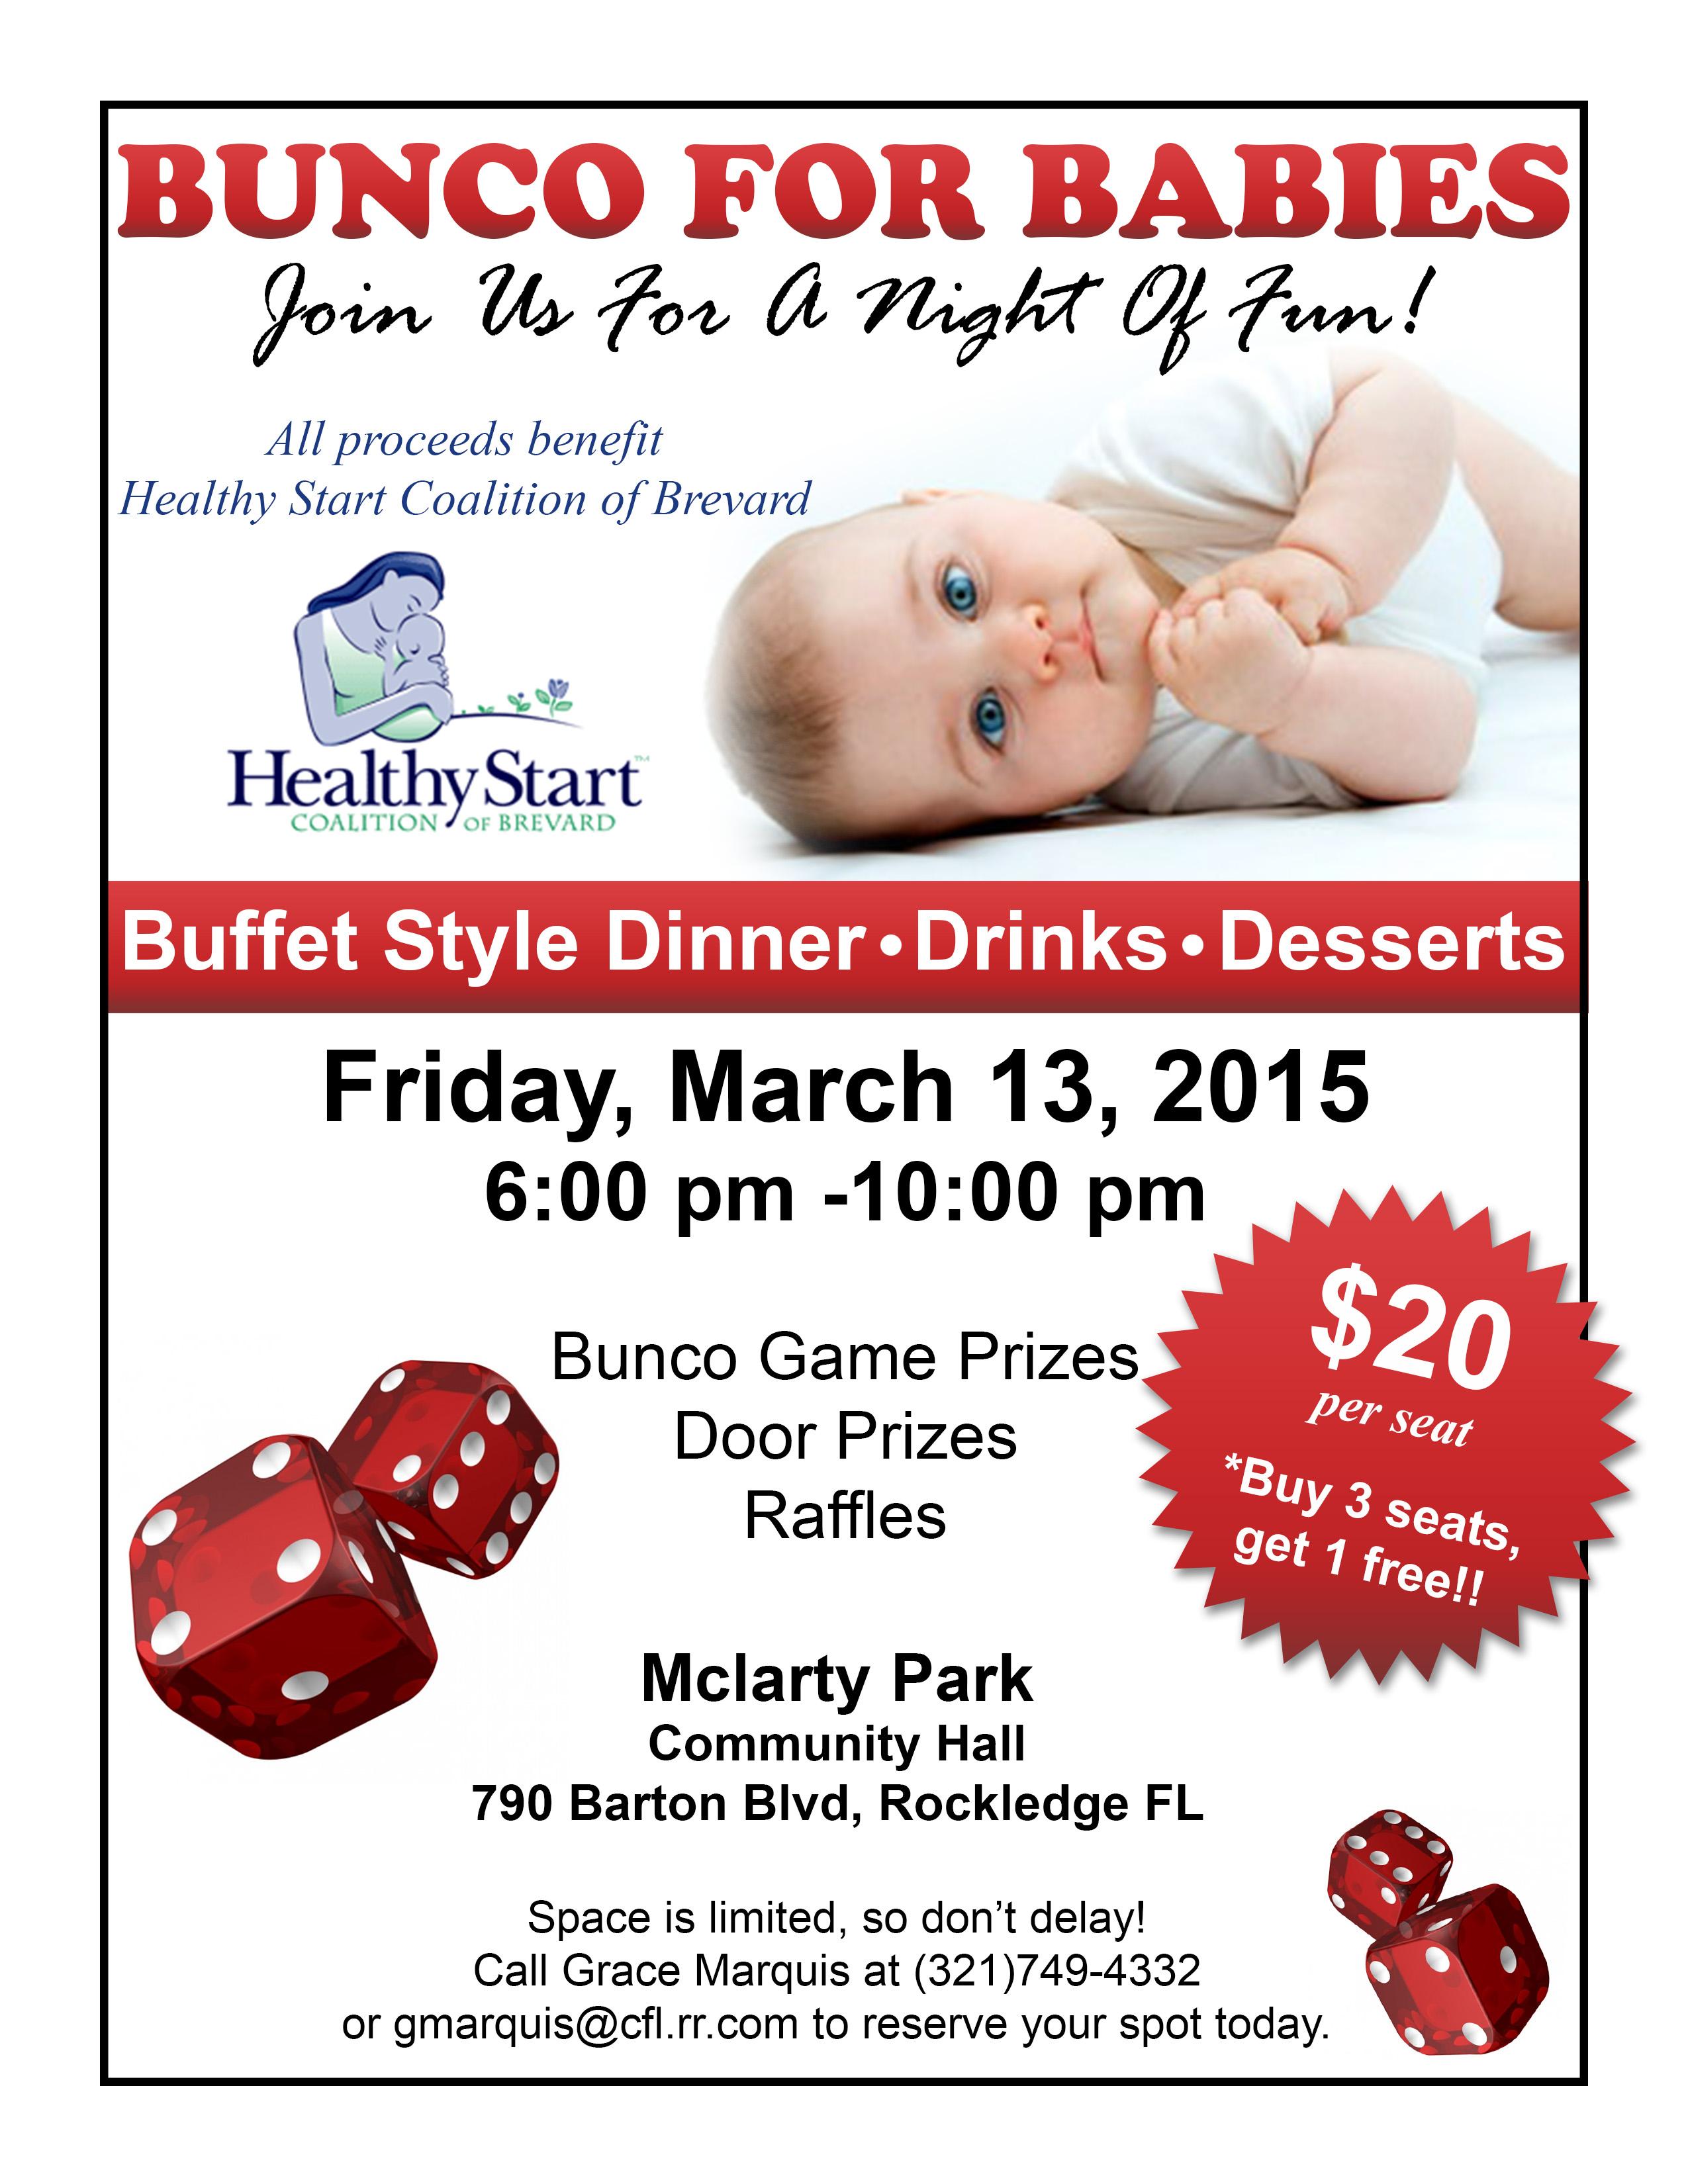 Healthy Start Bunco for Babies